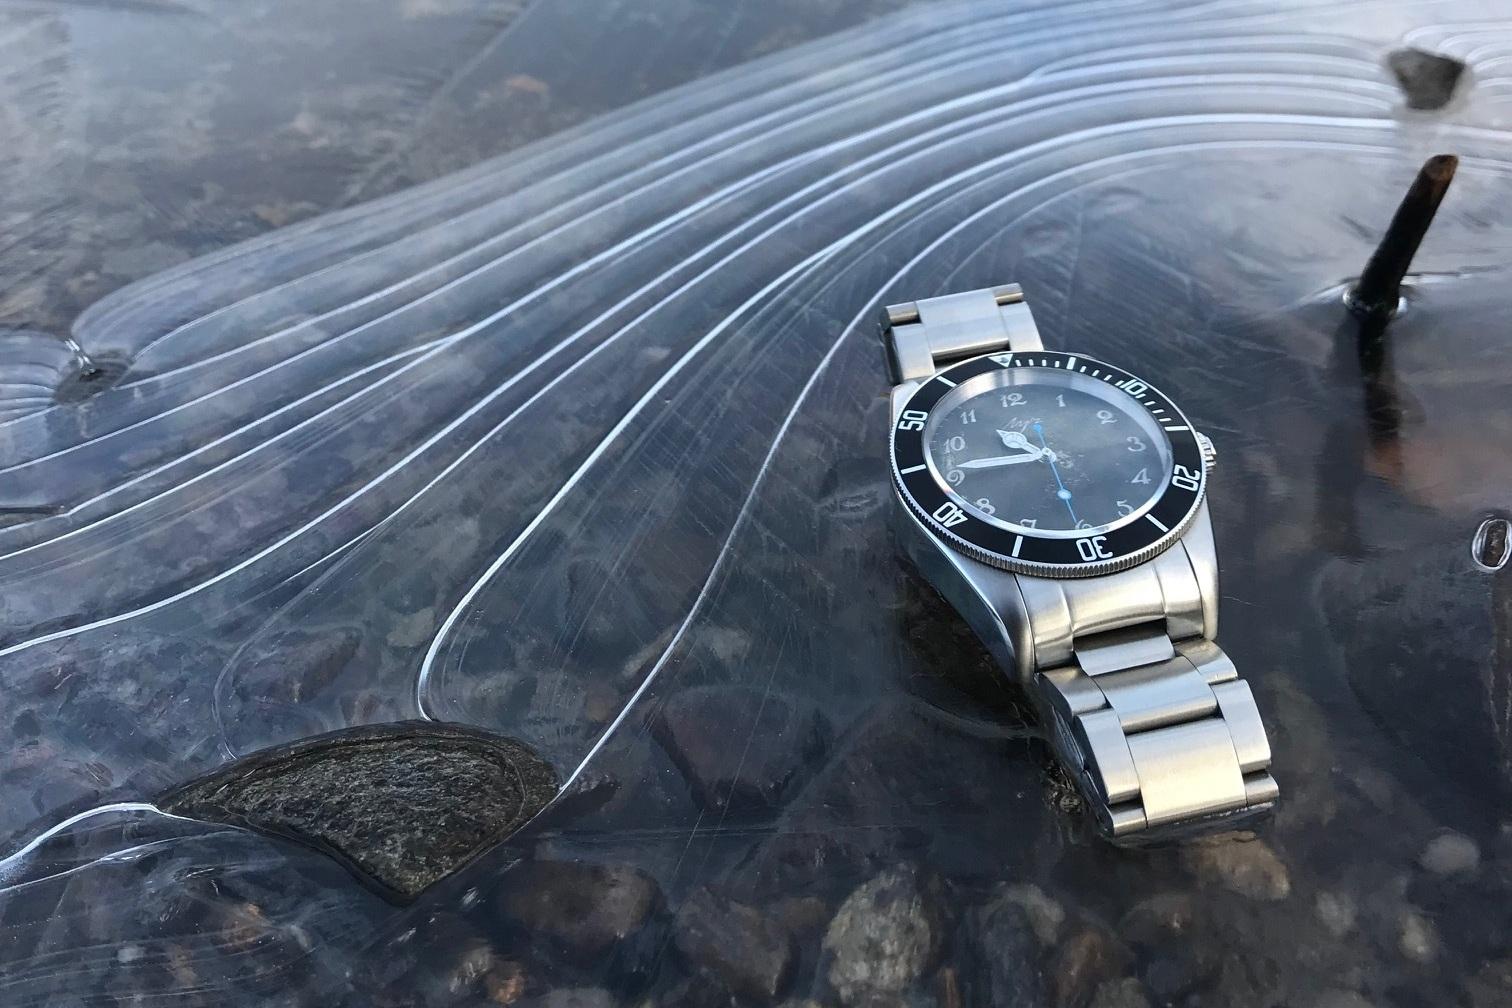 Tom Corneill Watches watch on ice.jpg